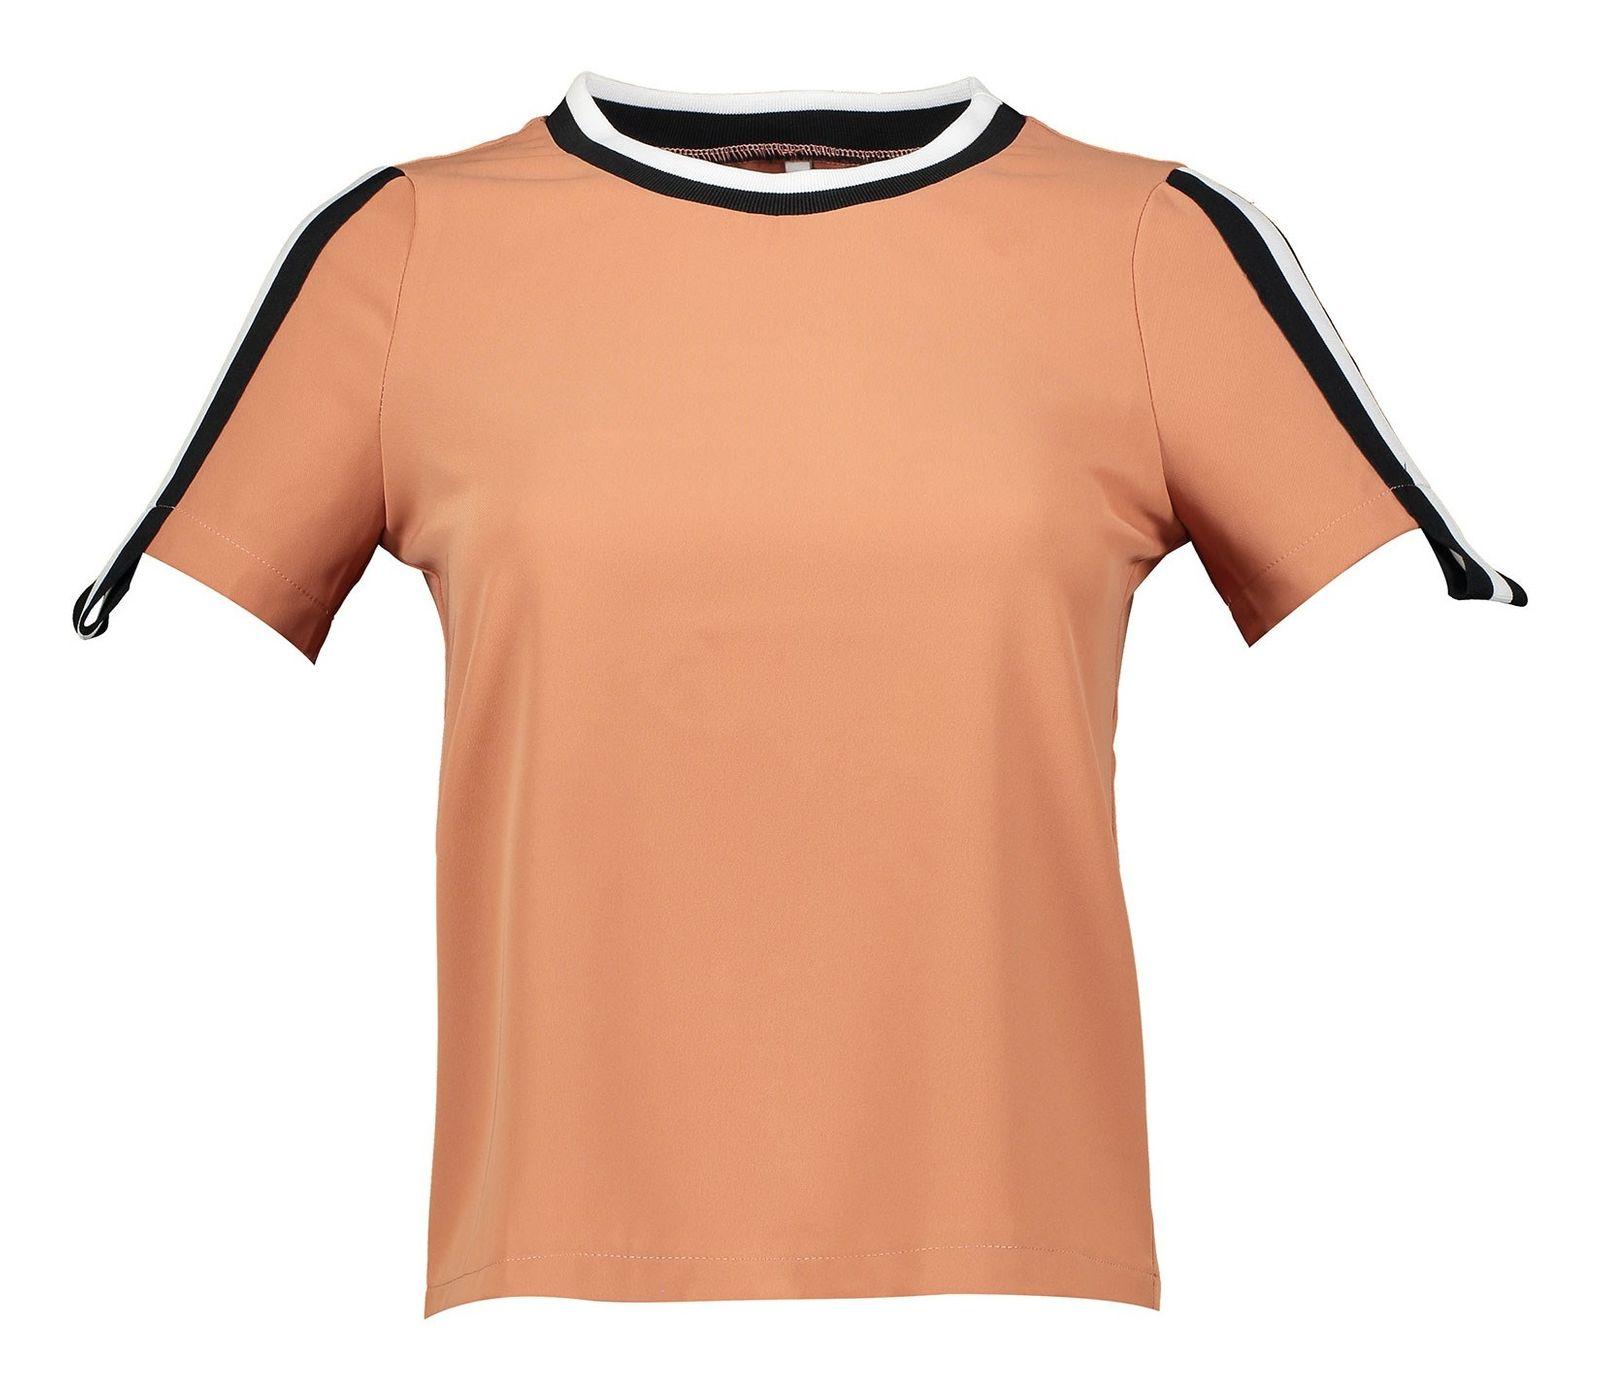 تی شرت یقه گرد زنانه - امپریال - نارنجي تيره - 2